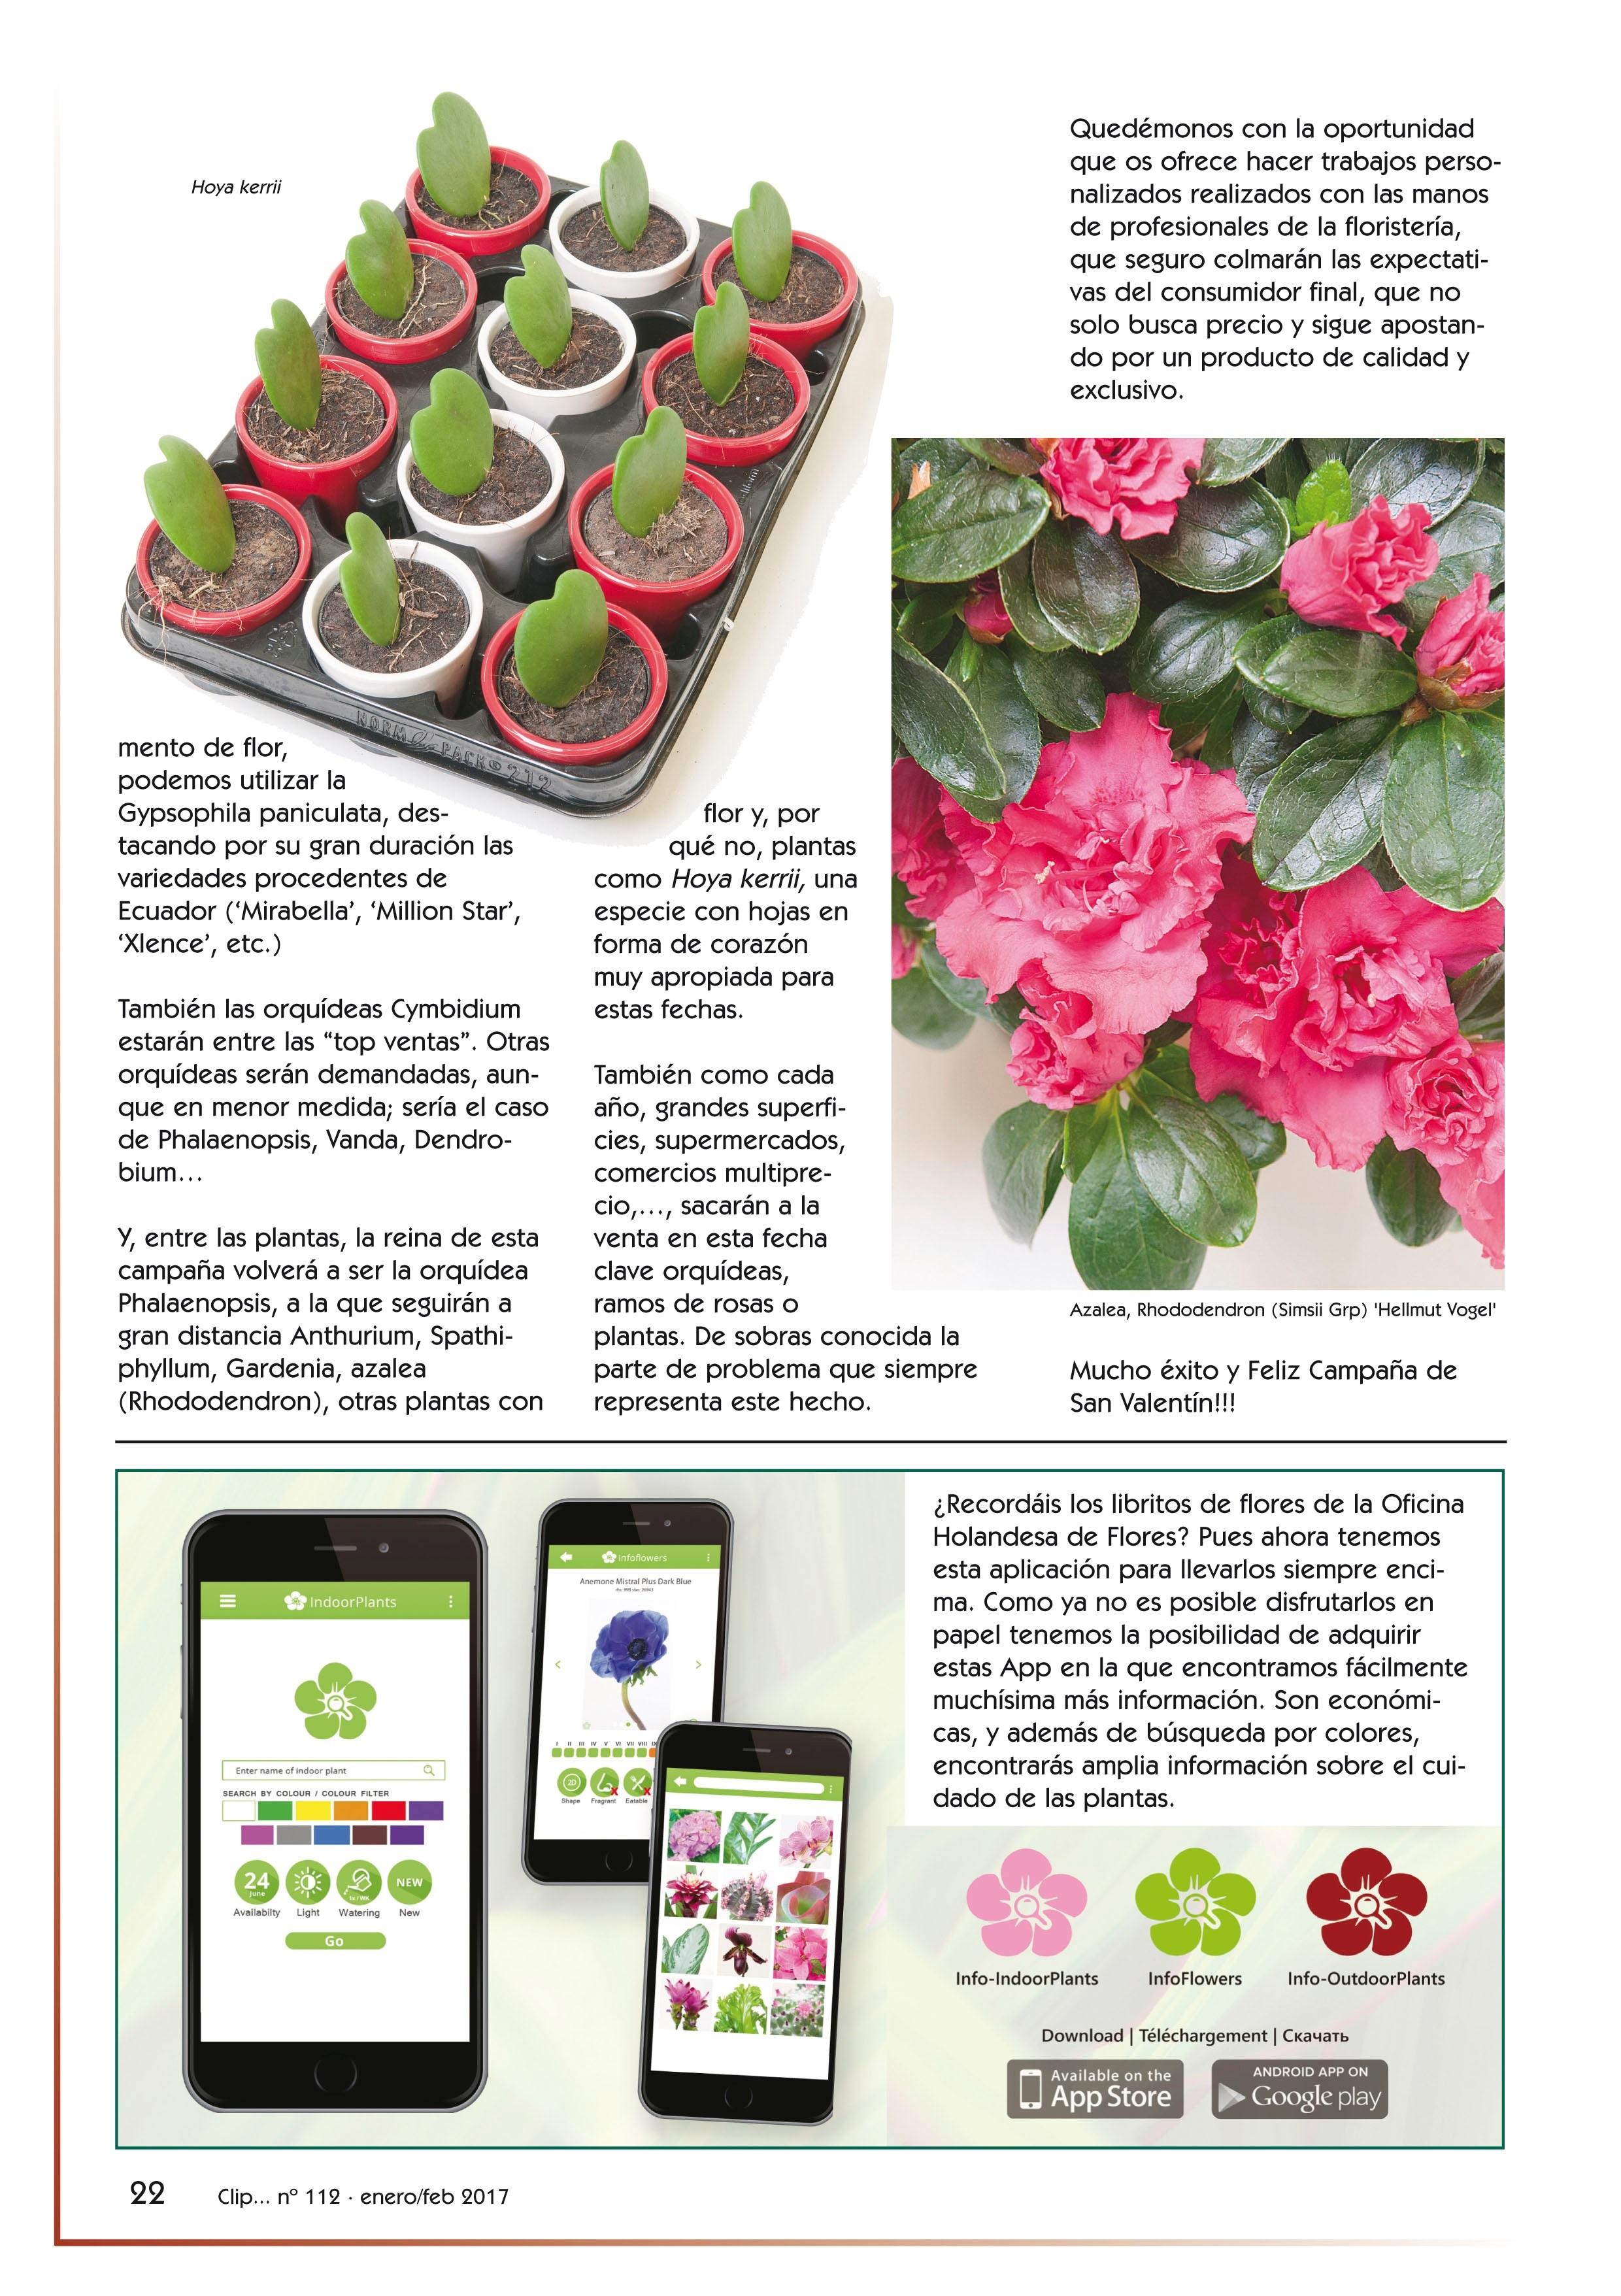 San Valentín ¿regalar flores o plantas? (clip nº 112, pág. 22)